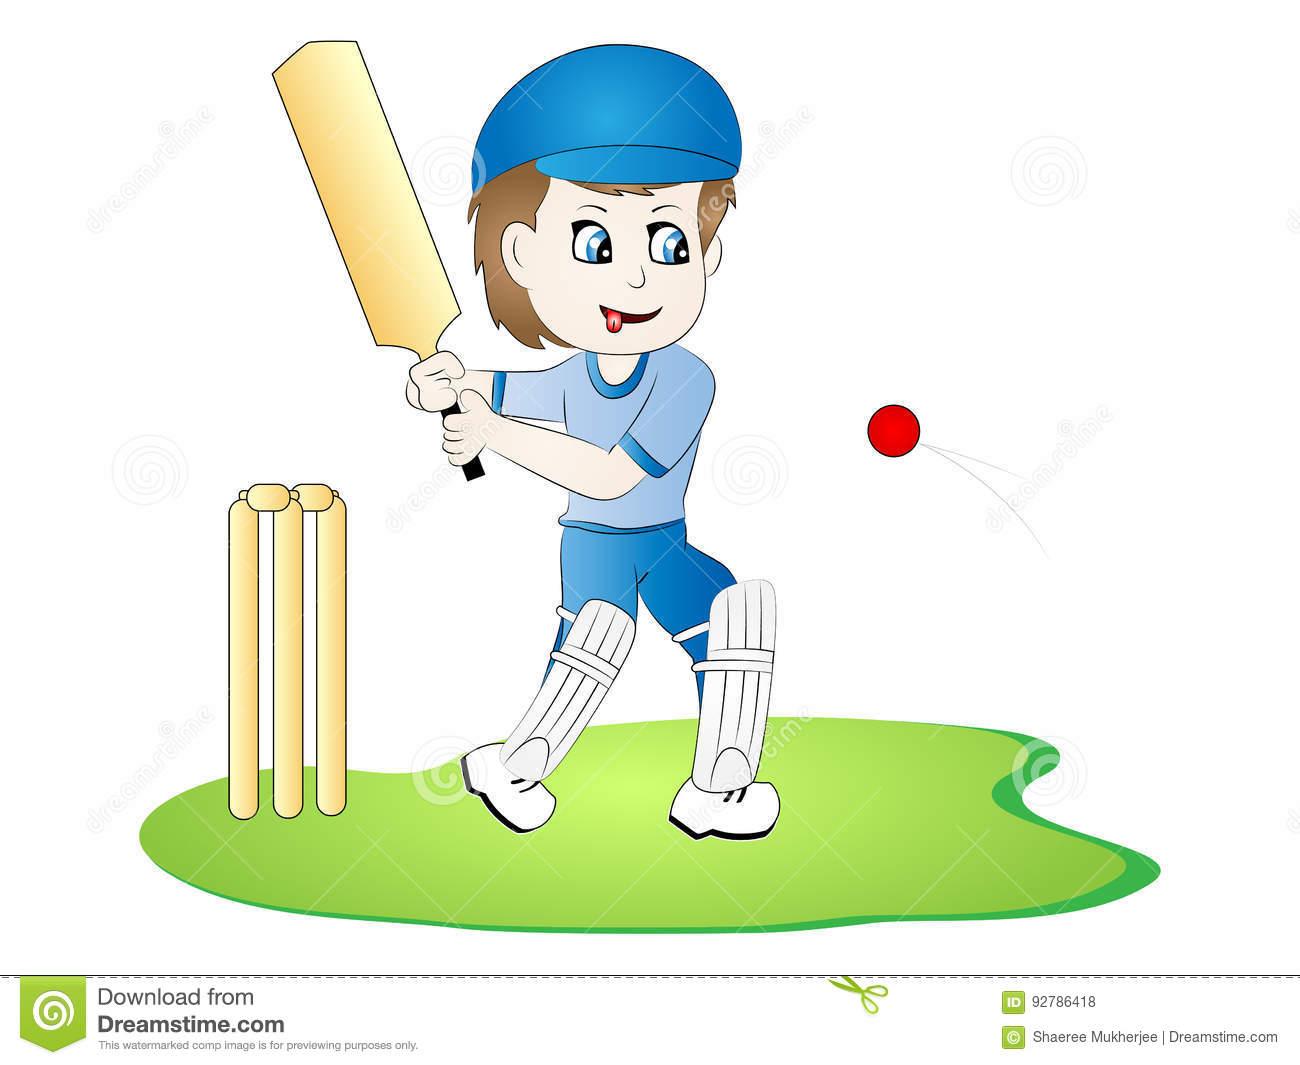 Cartoon cricket clipart 2 » Clipart Station.